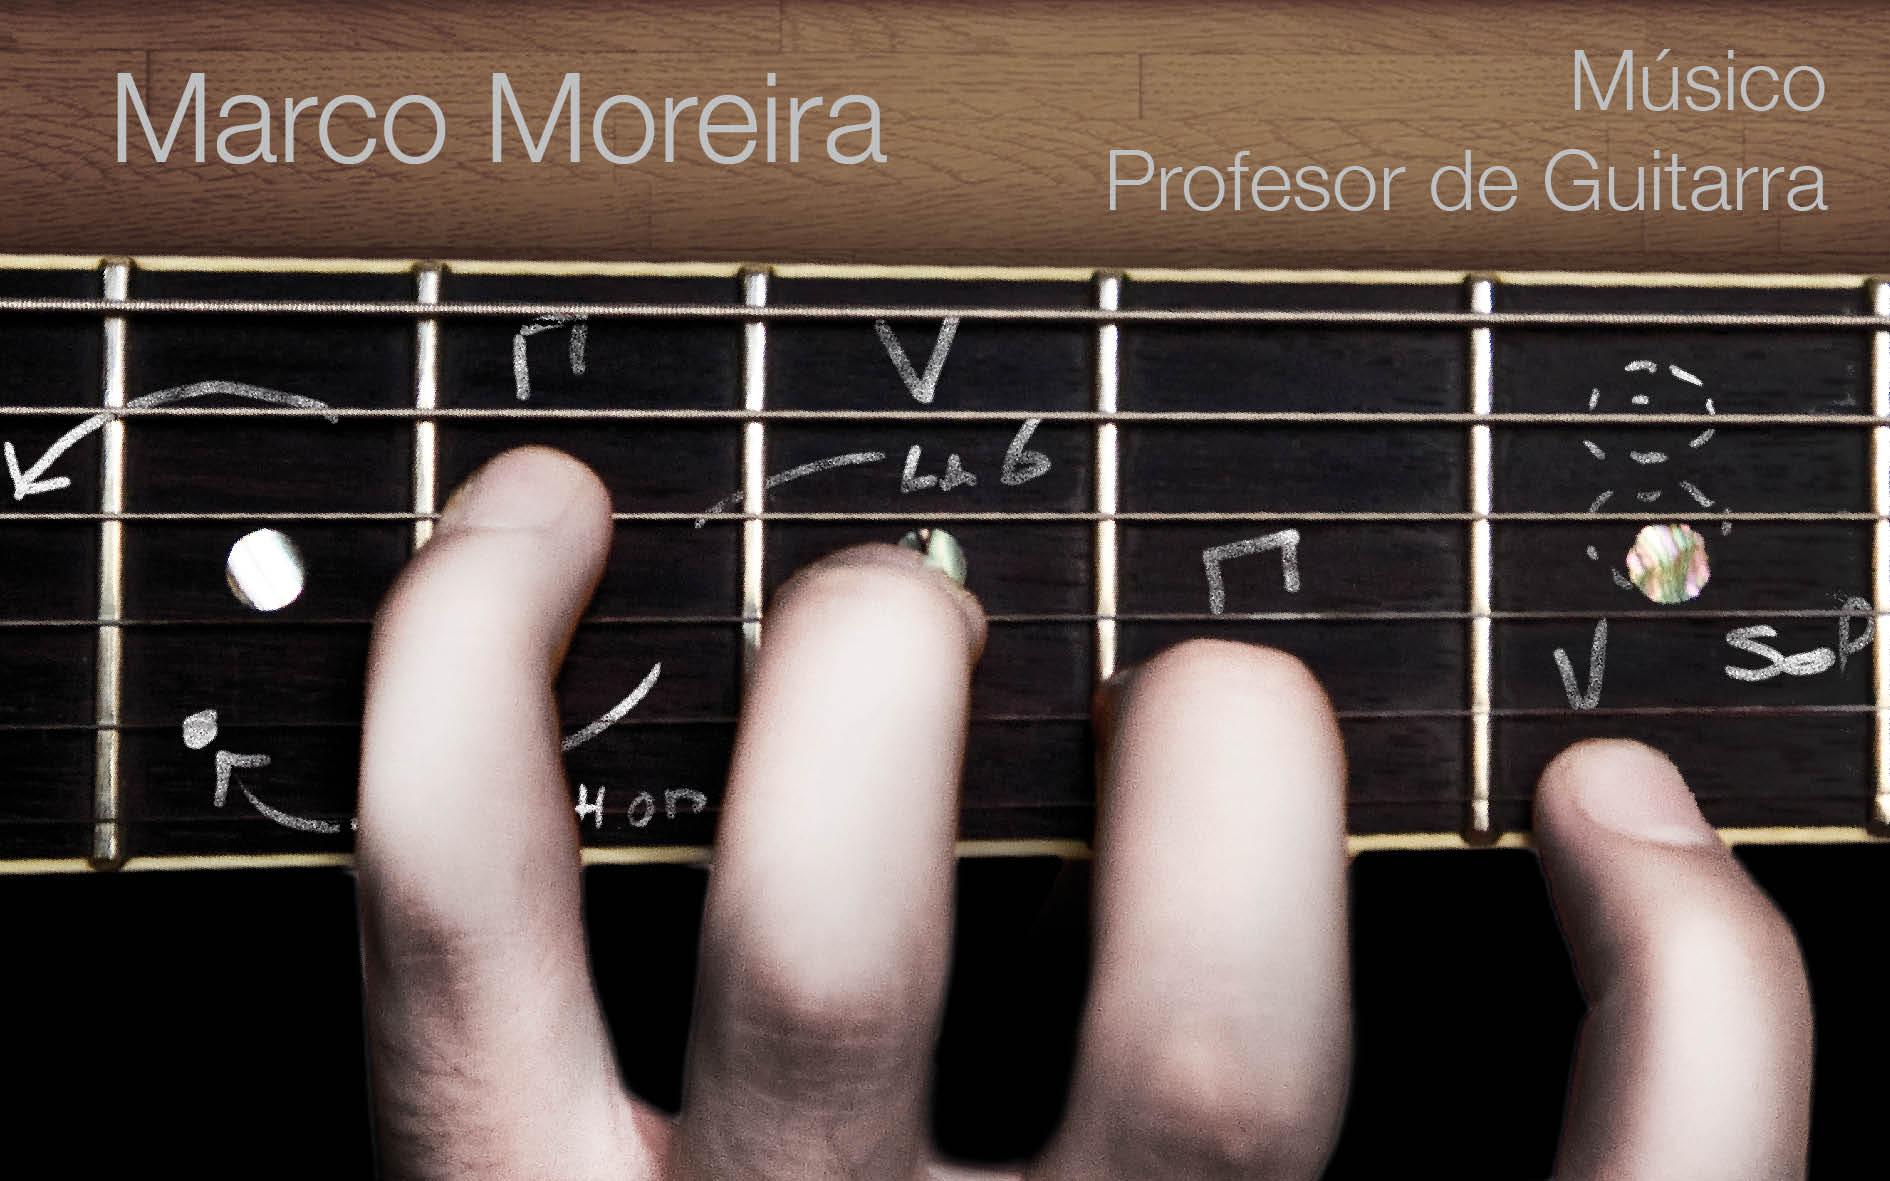 Clases de Guitarra Online - Información & Contacto - CLASES DE GUITARRA BARCELONA